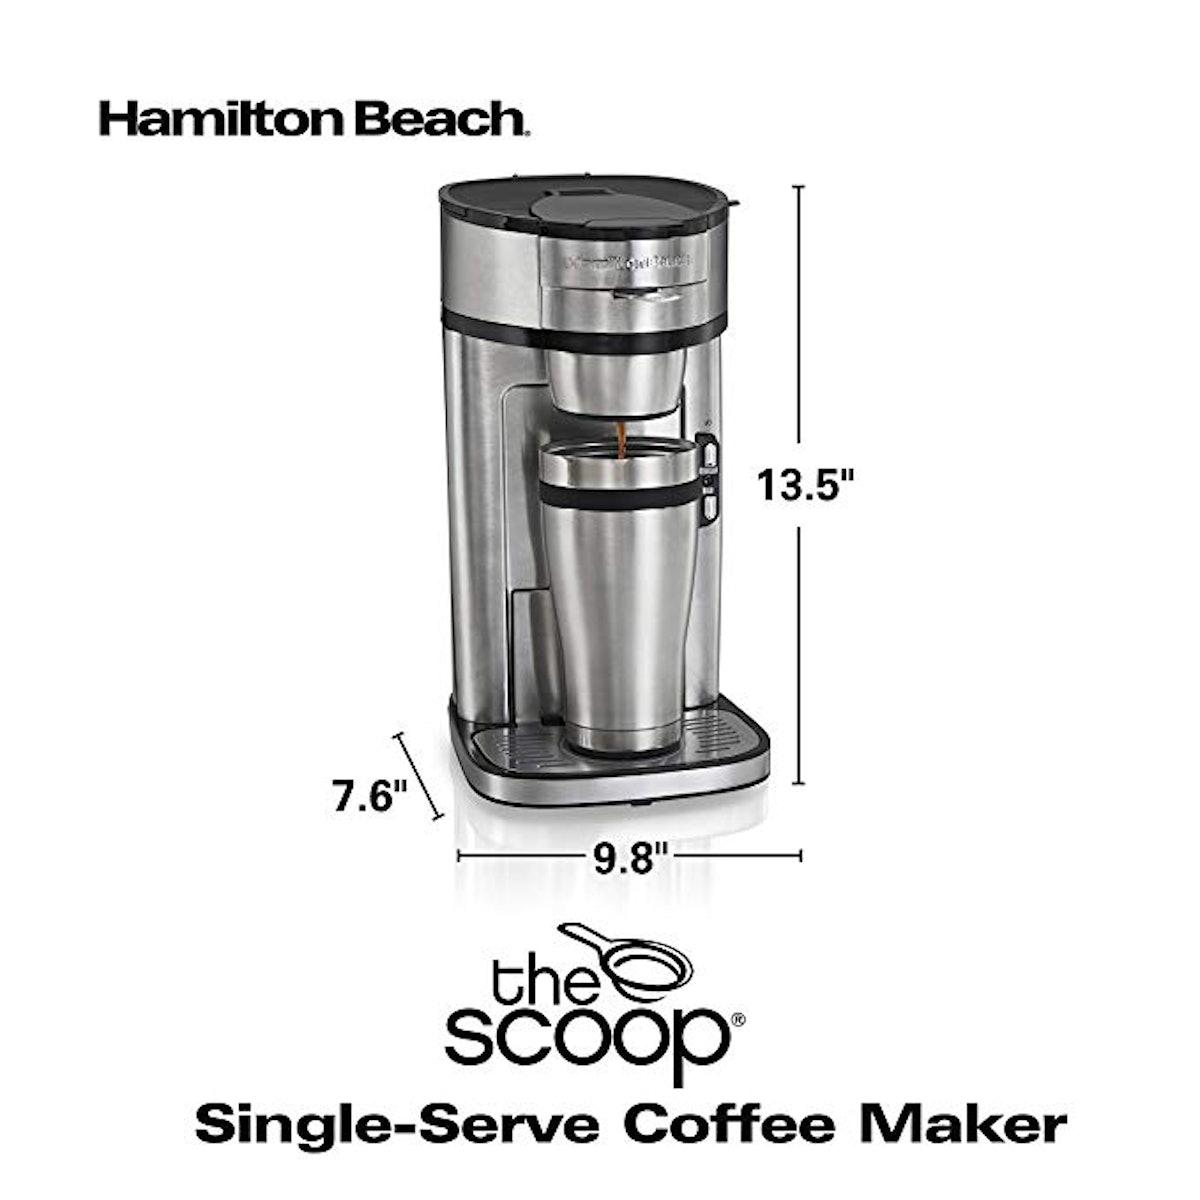 Hamilton Beach Scoop Single Serve Coffee Maker